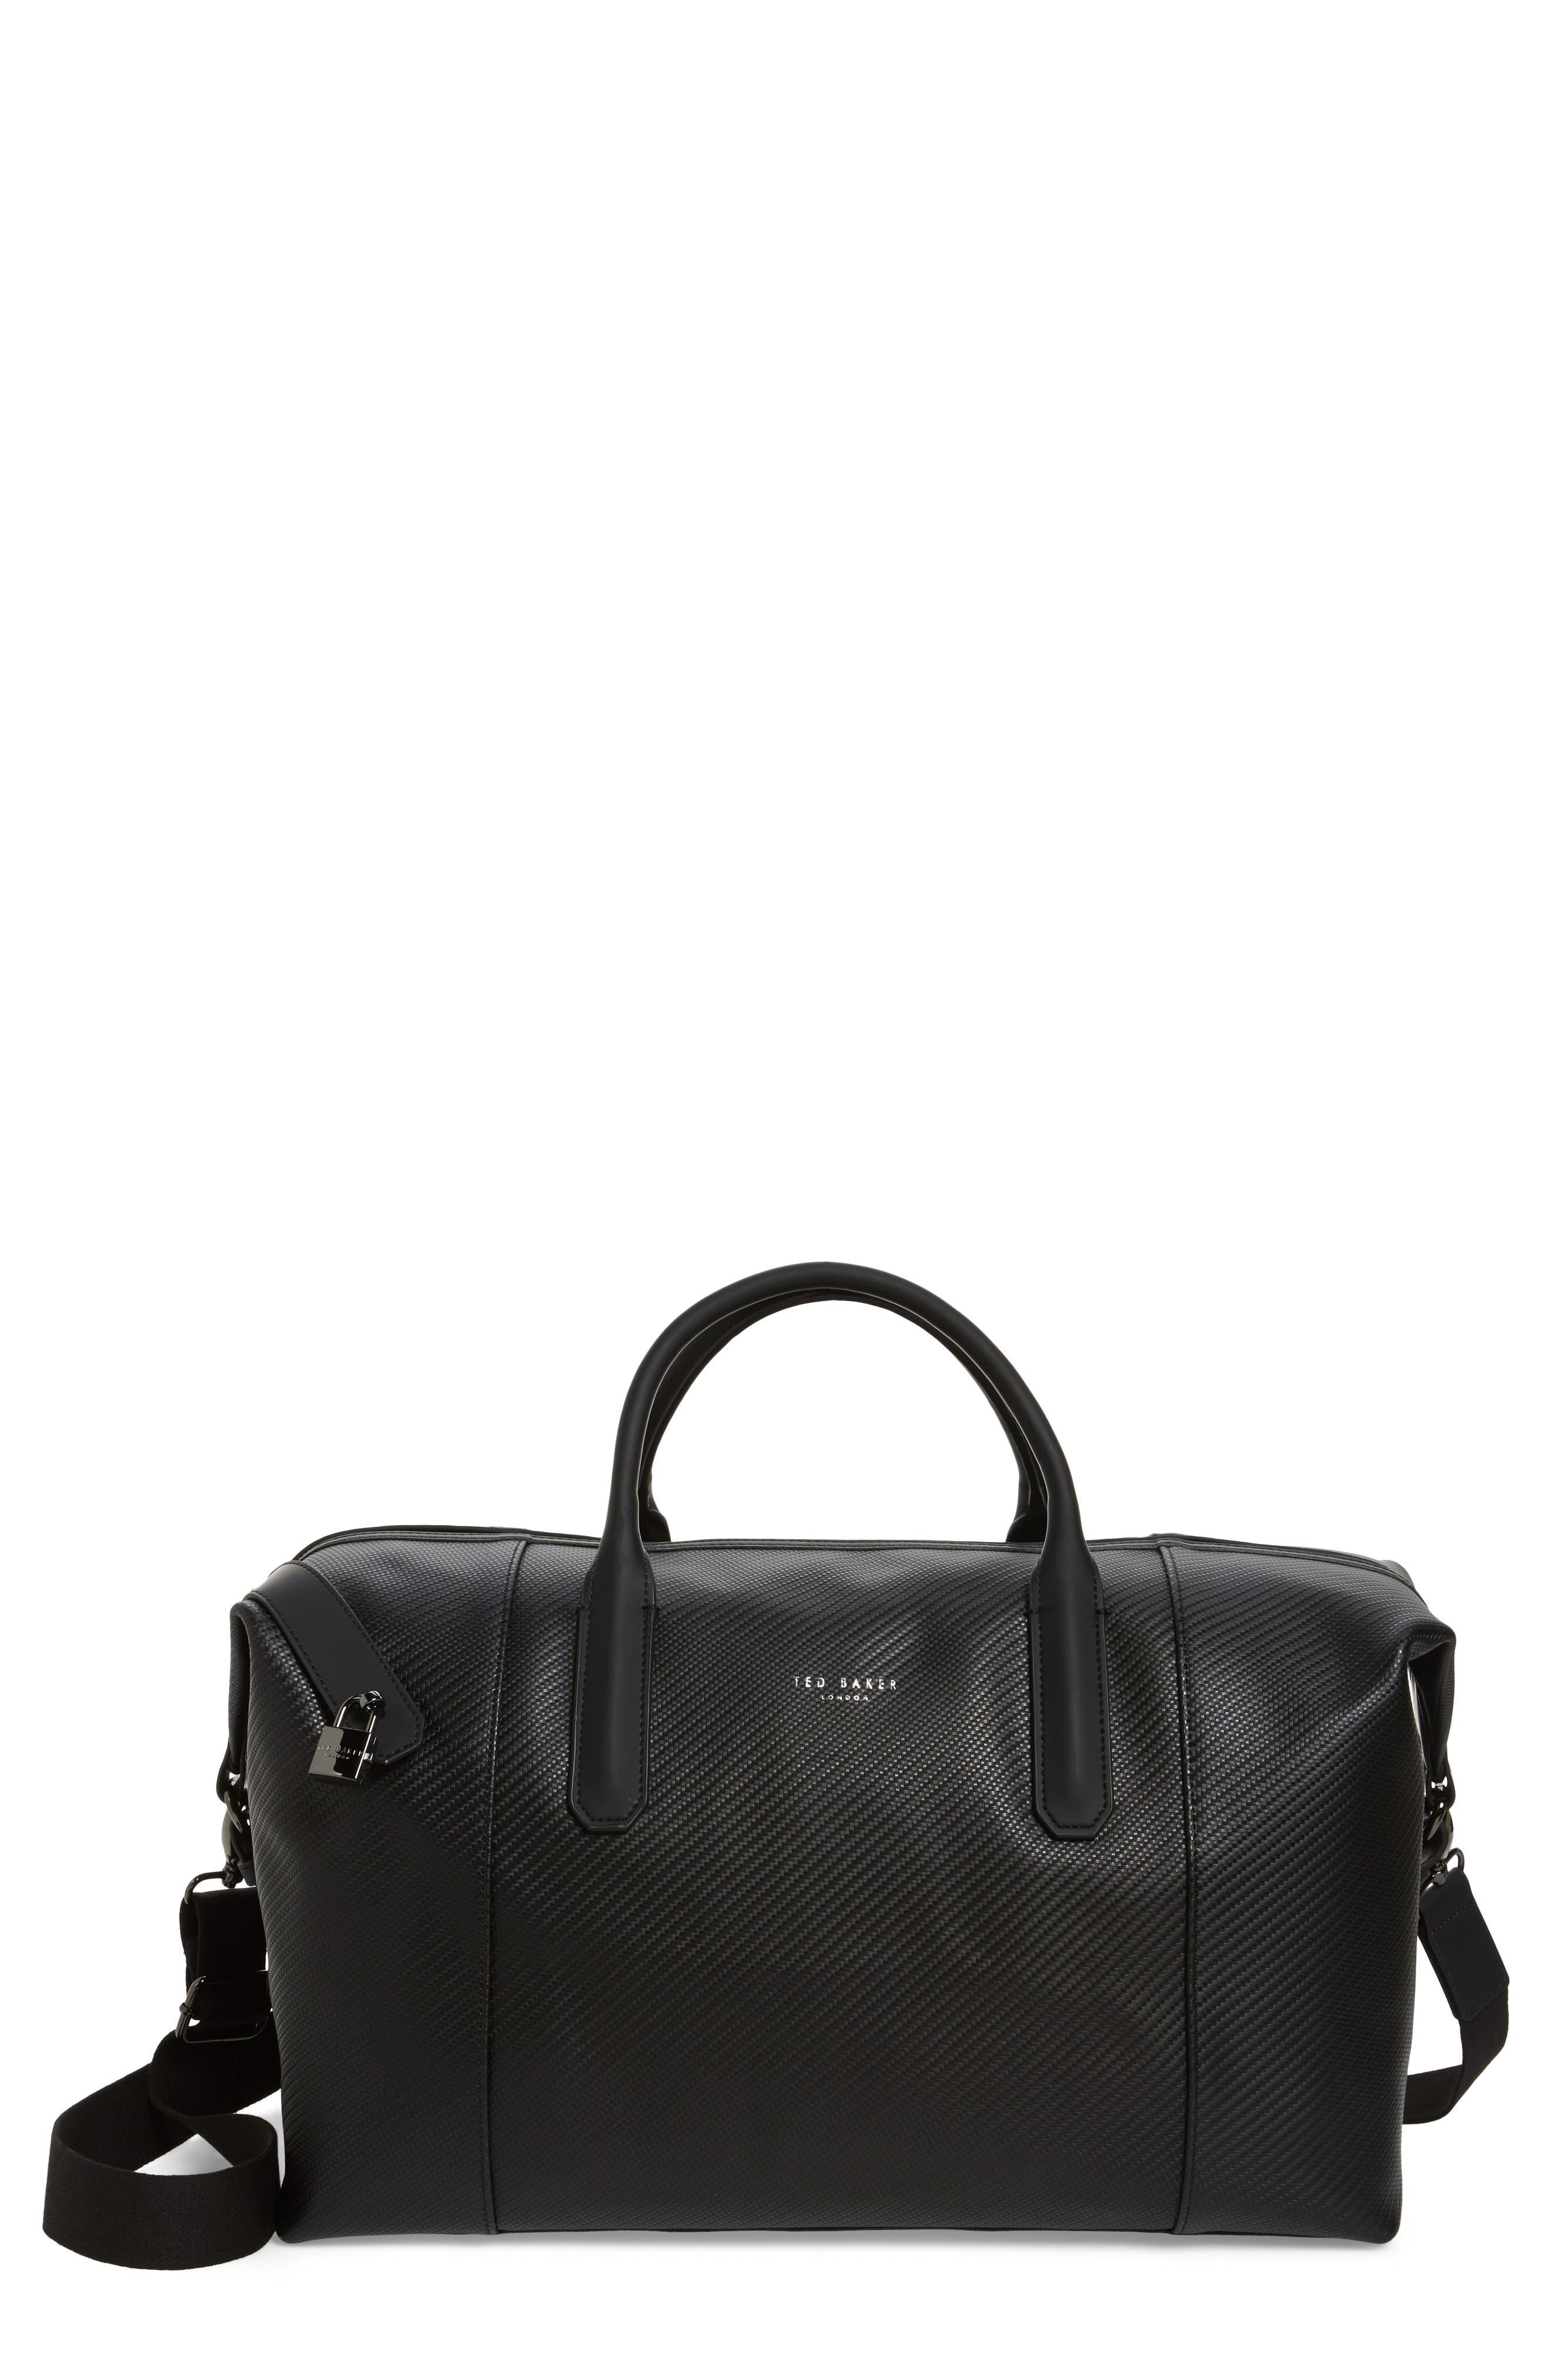 Novana Leather Duffel Bag,                         Main,                         color,